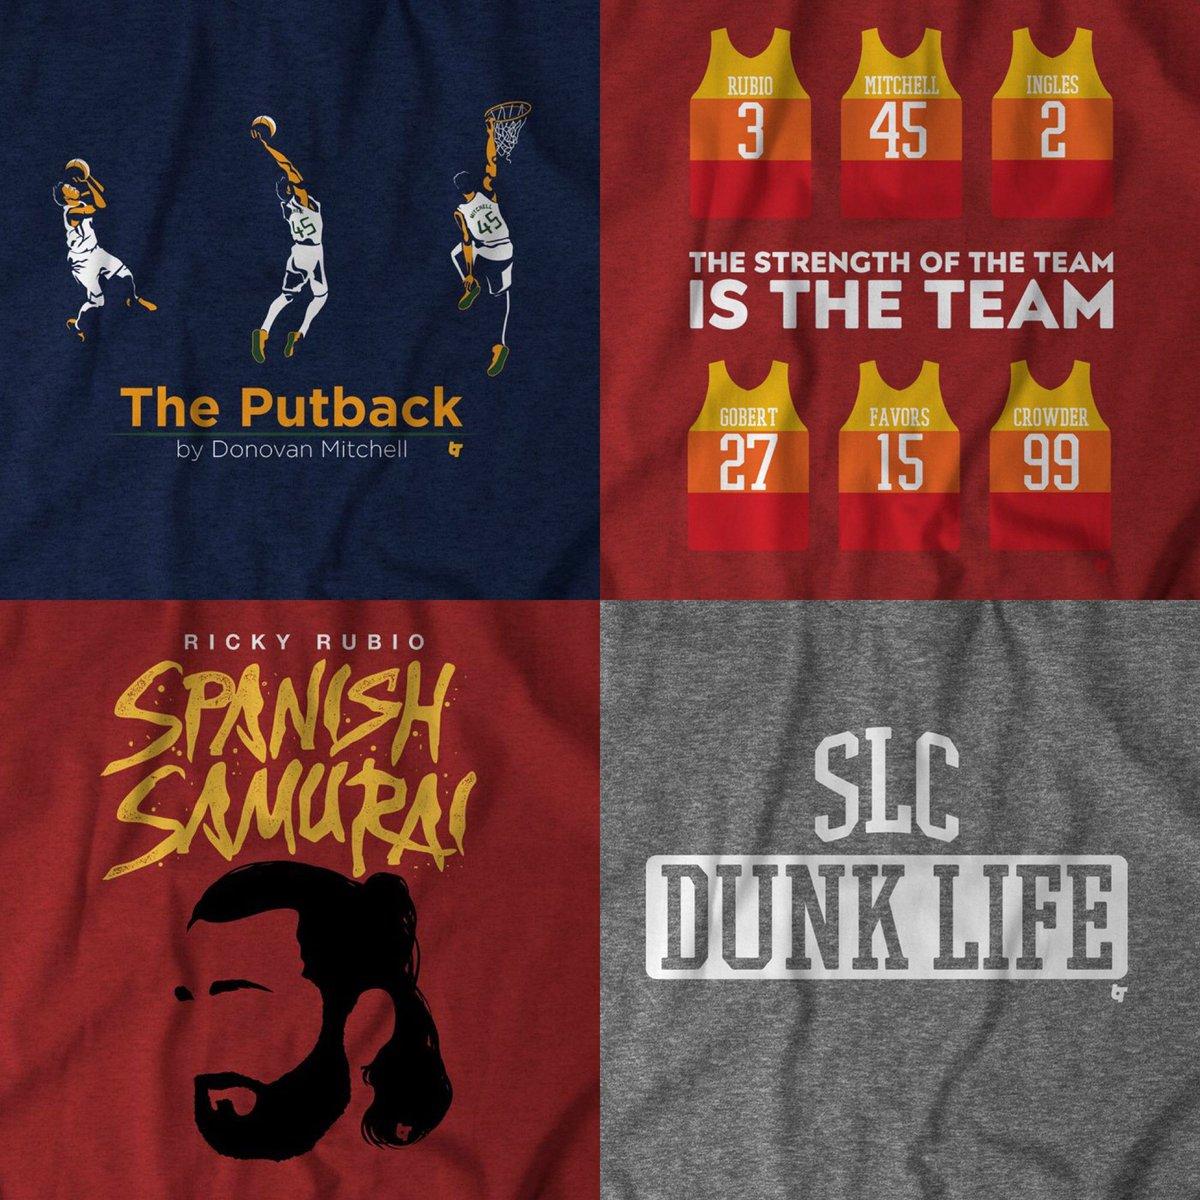 ... https   www.slcdunk.com utah-jazz-social-media-take-note 2018  5 4 17318728 2018-nba-playoffs-utah-jazz-slc-dunk-t-shirt-shop-apparel-merchandise-  ... b01084768